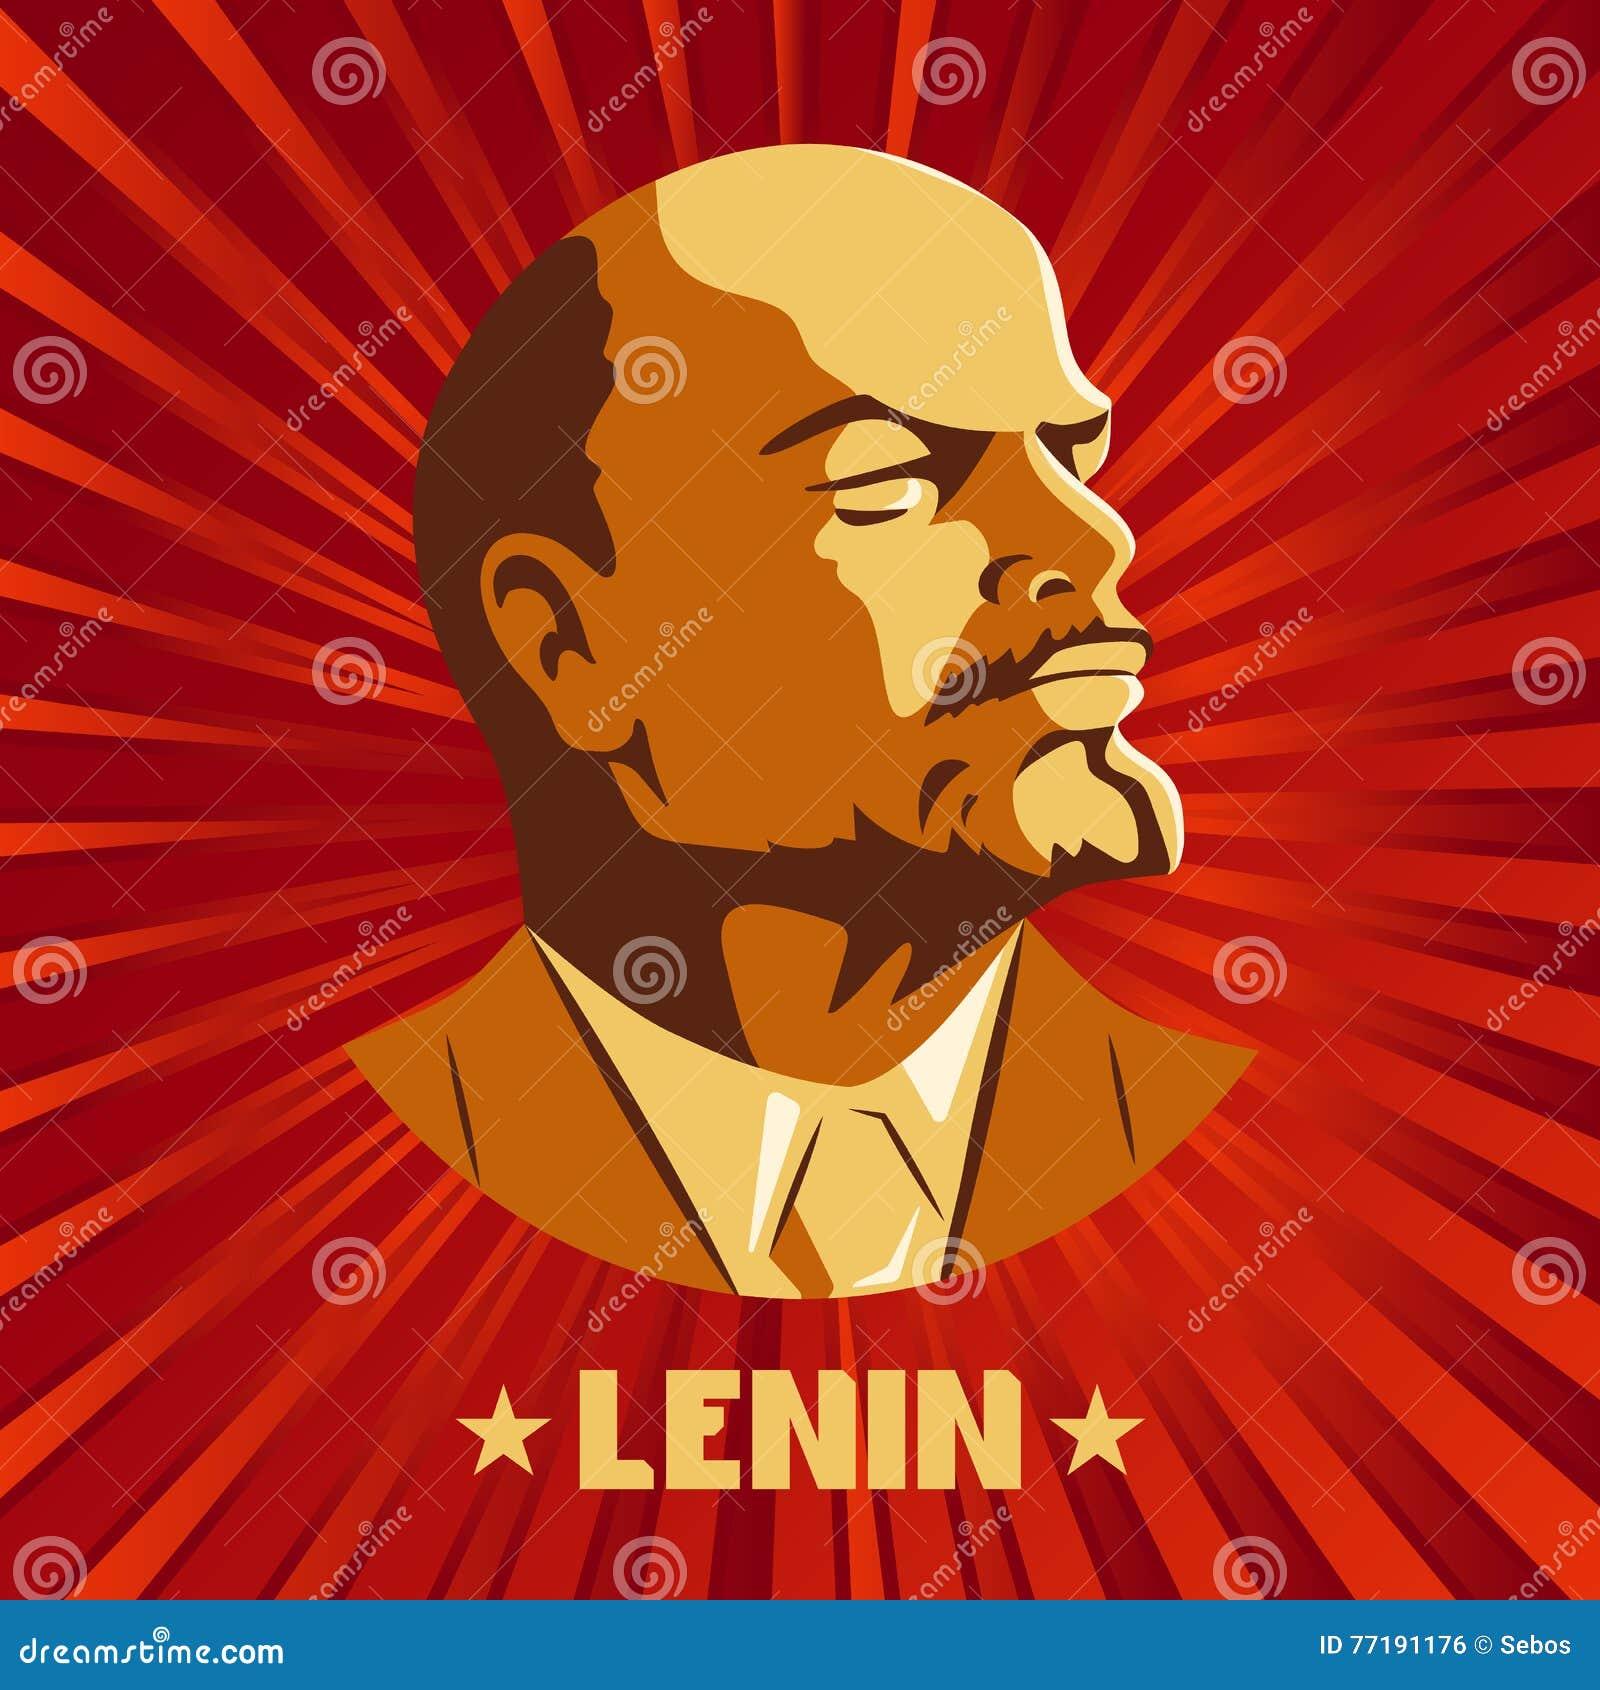 Poster Stylized Soviet Style Leader Ussr Russian Revolutionary Symbol